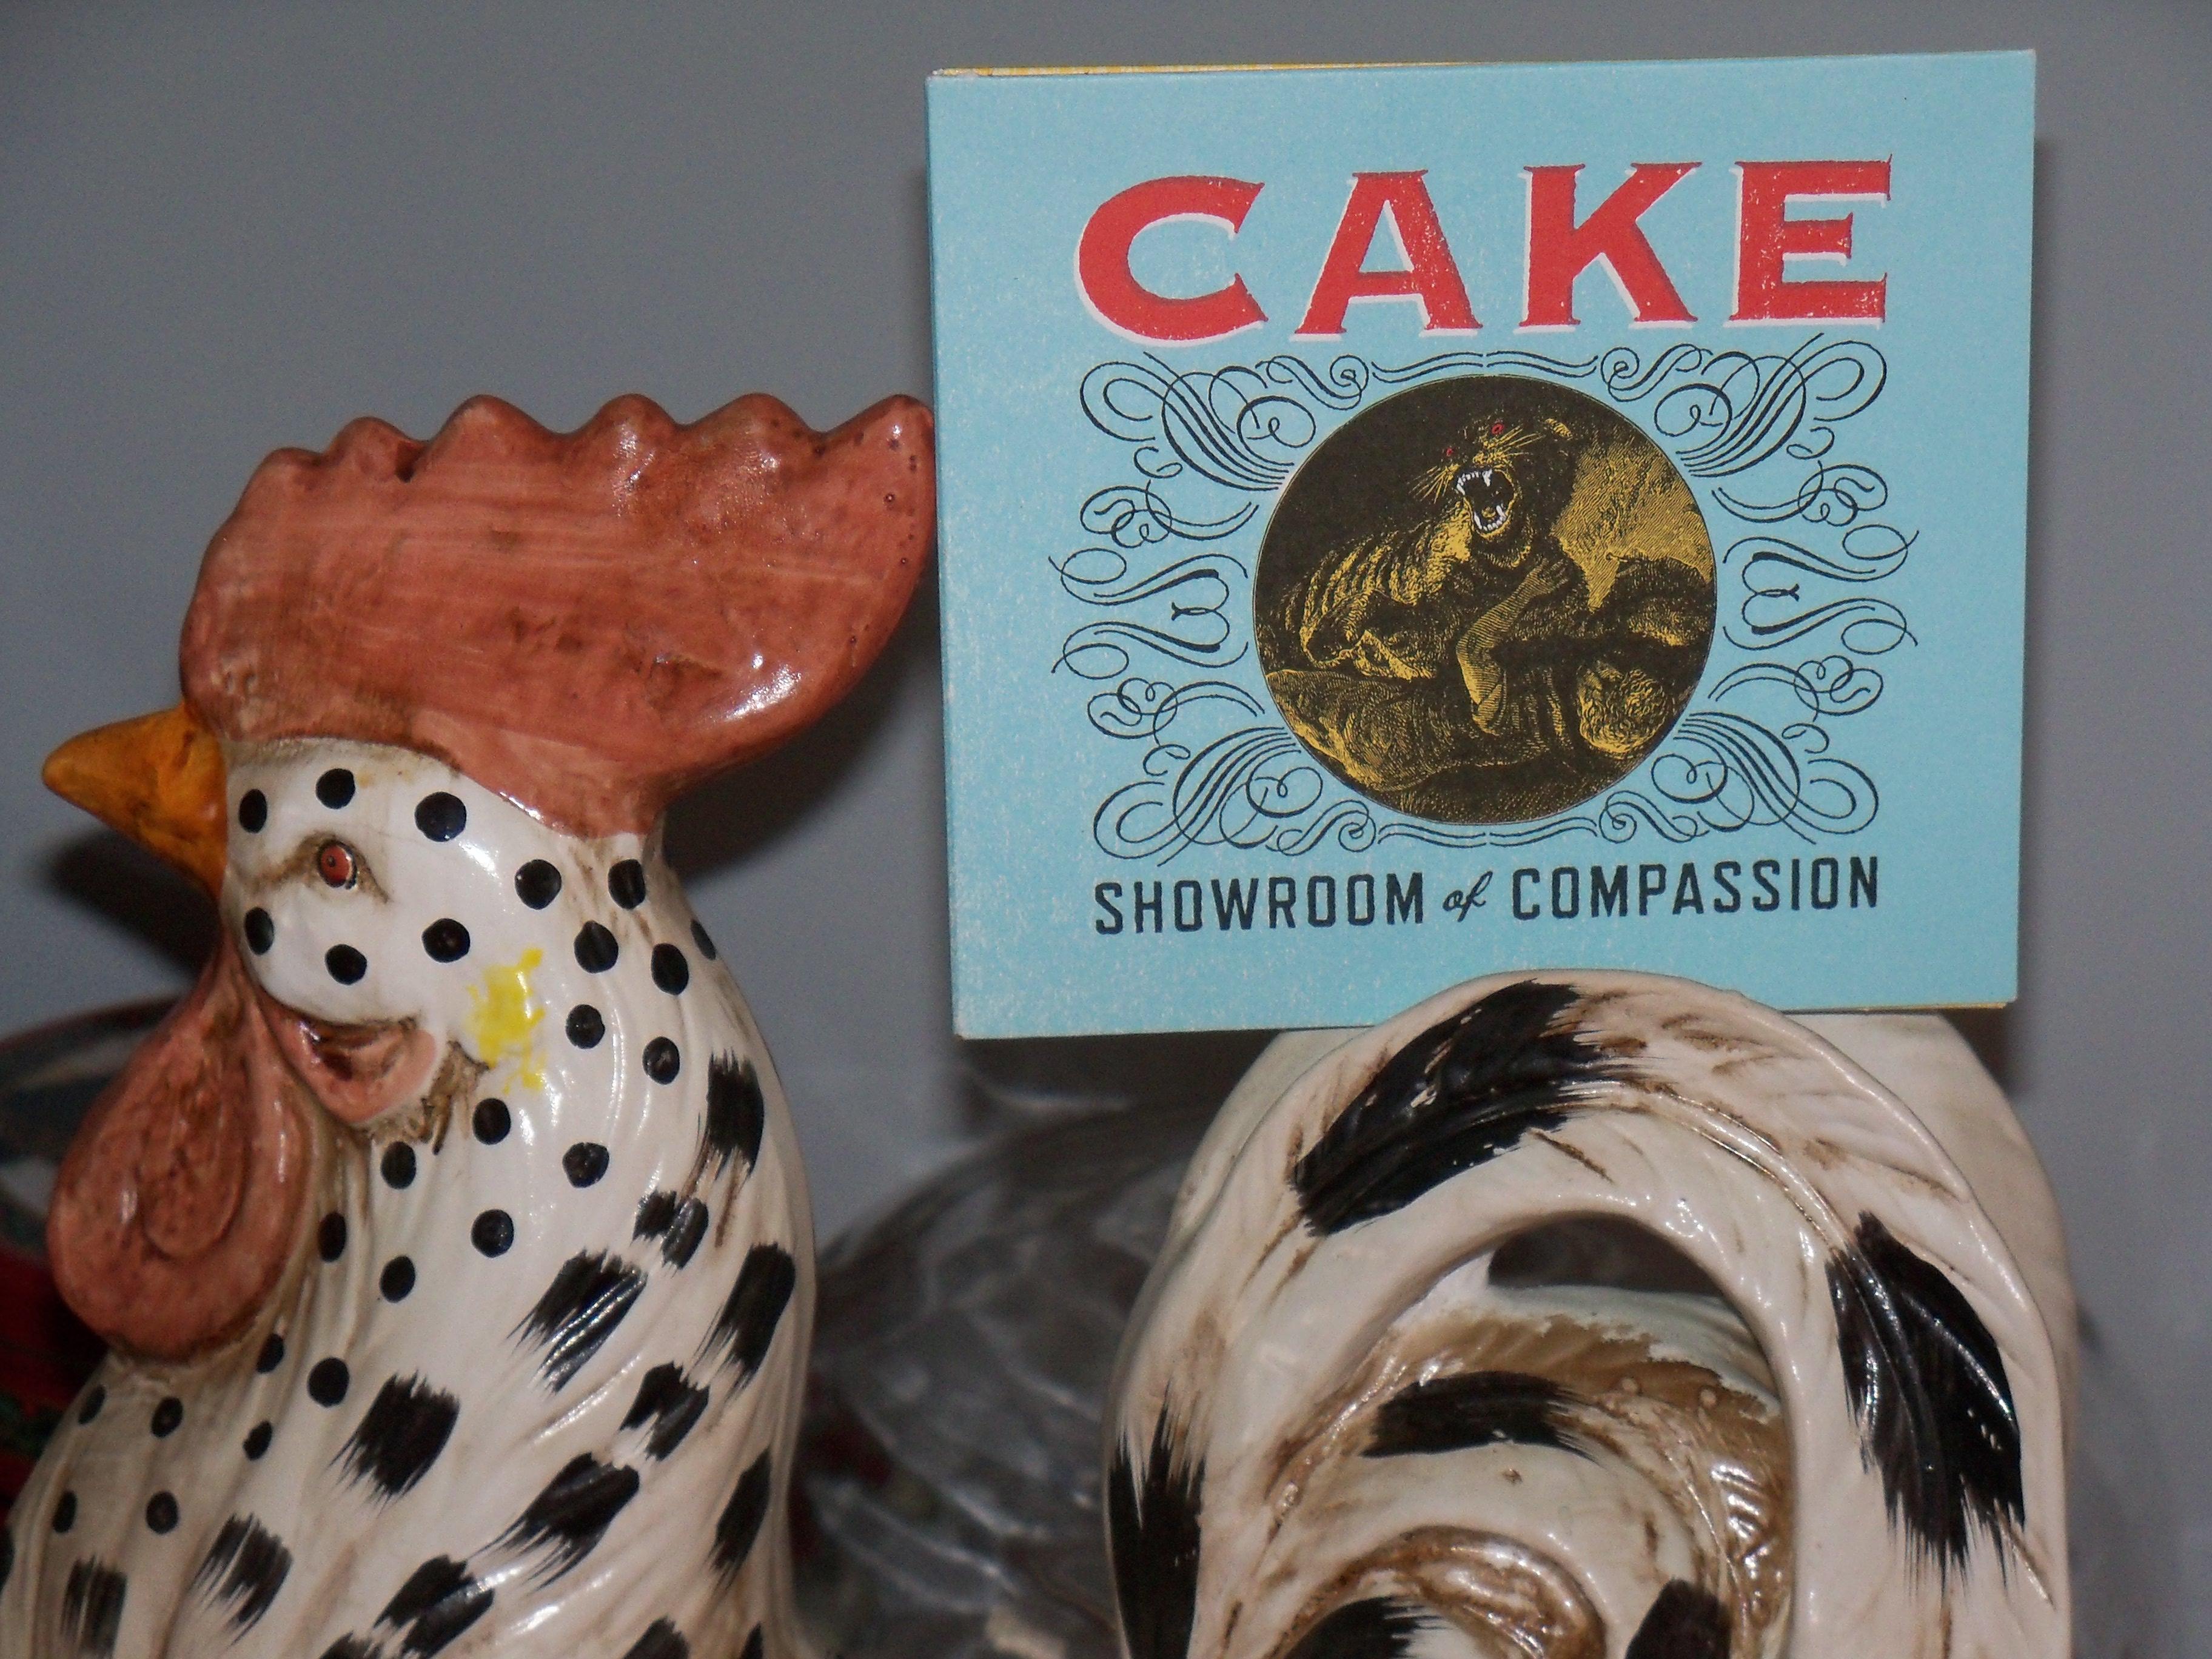 Cake Motorcade Of Generosity Review